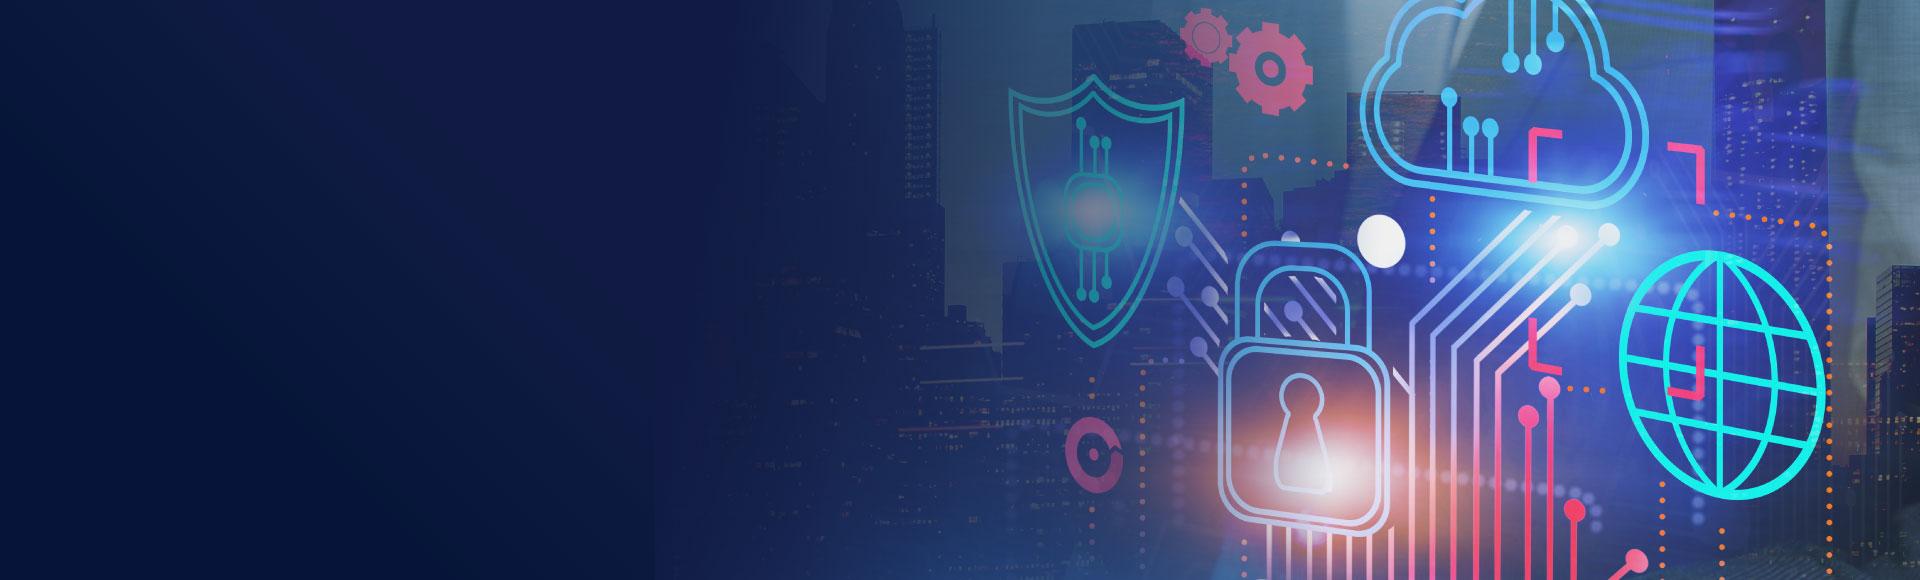 AnyBackup Family 7  VMware 分级保护方案